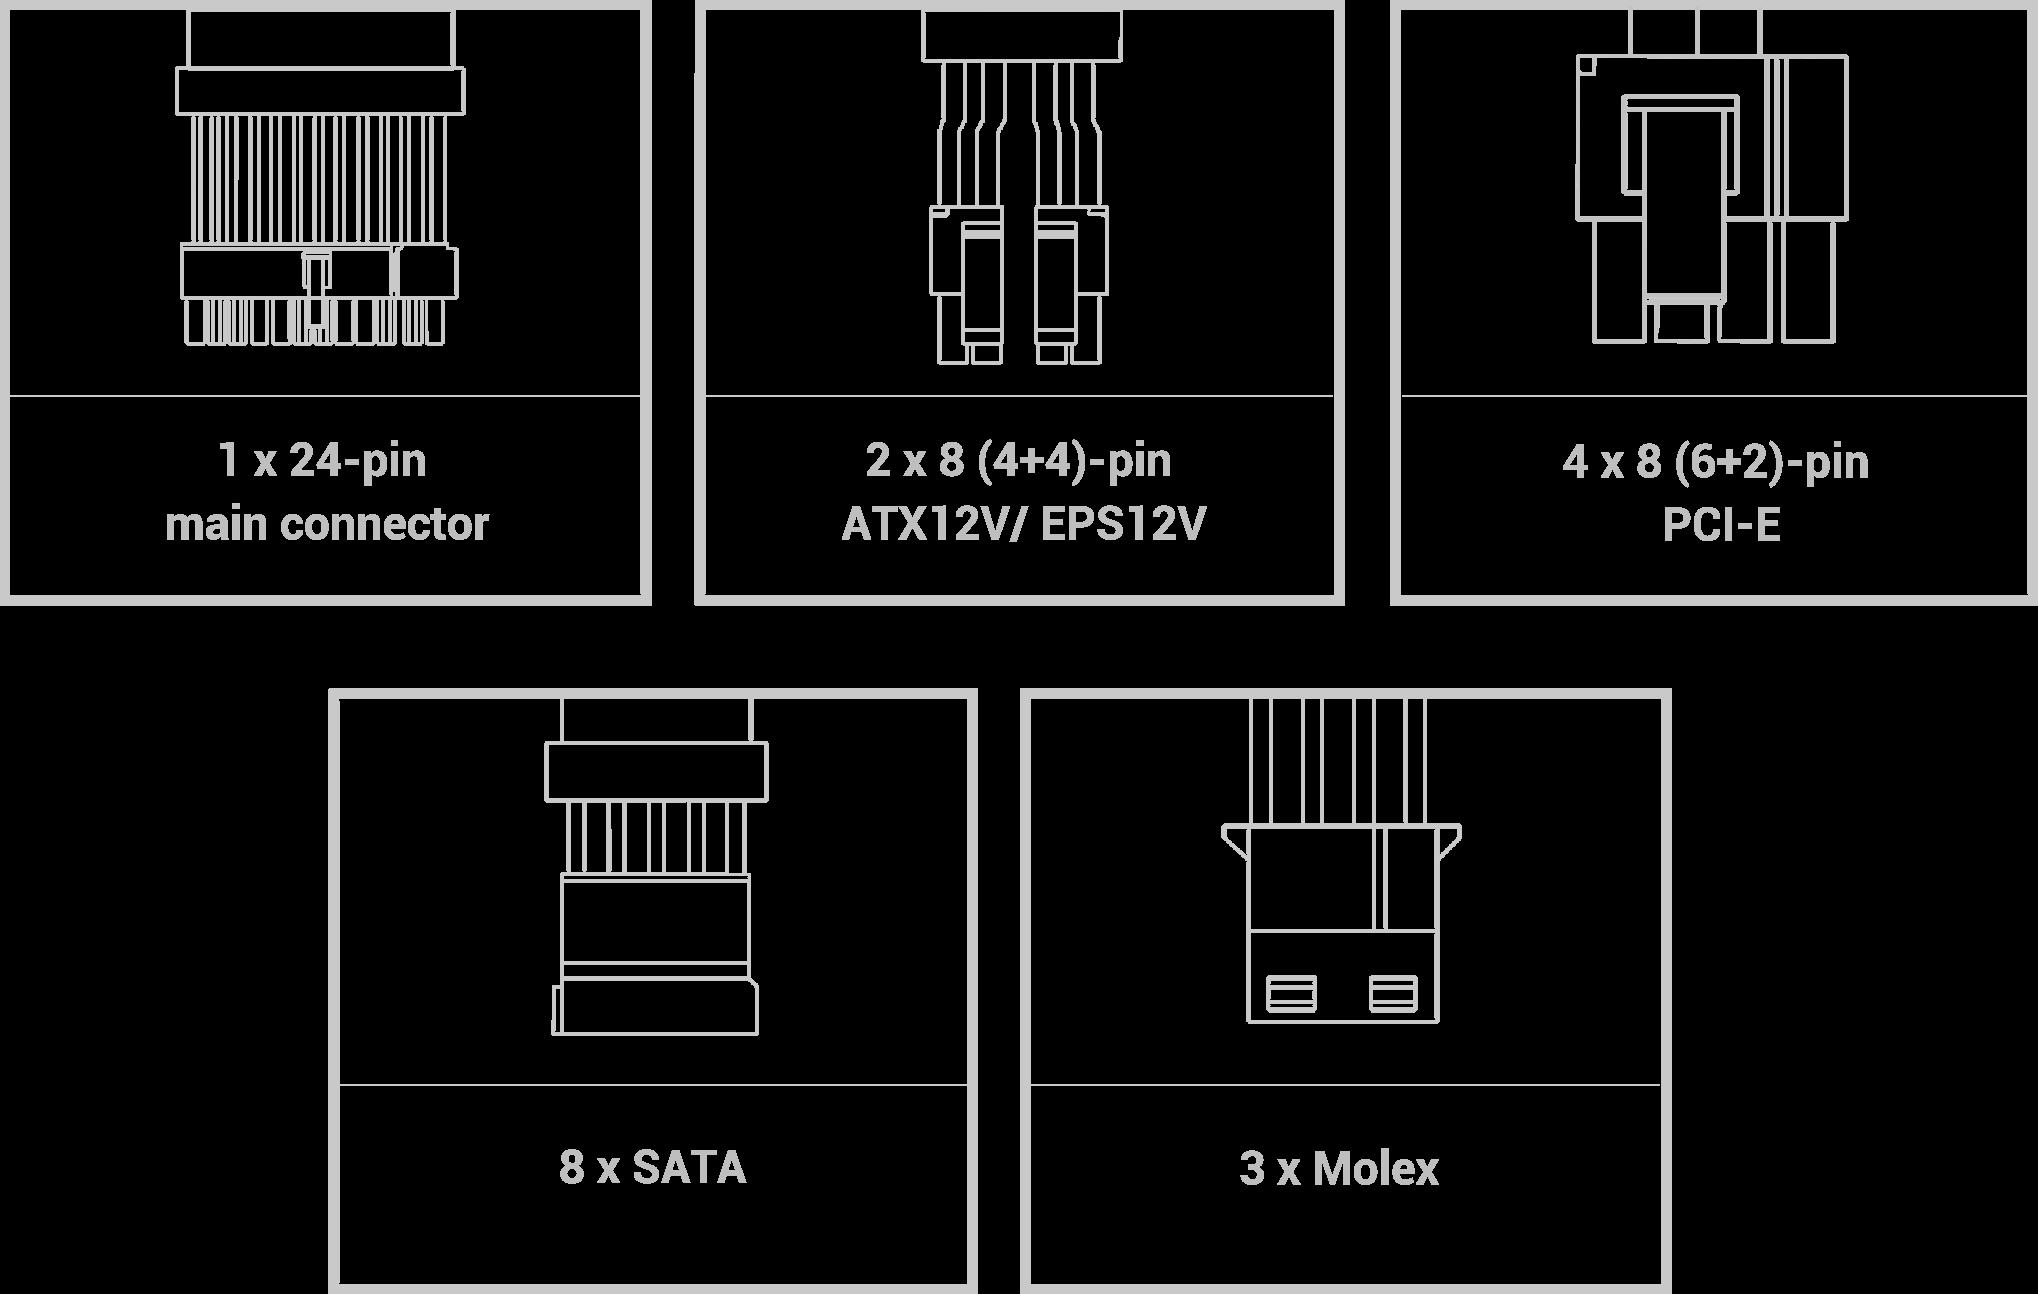 ANTEC CSK750H 80 PLUS BRONZE-overview